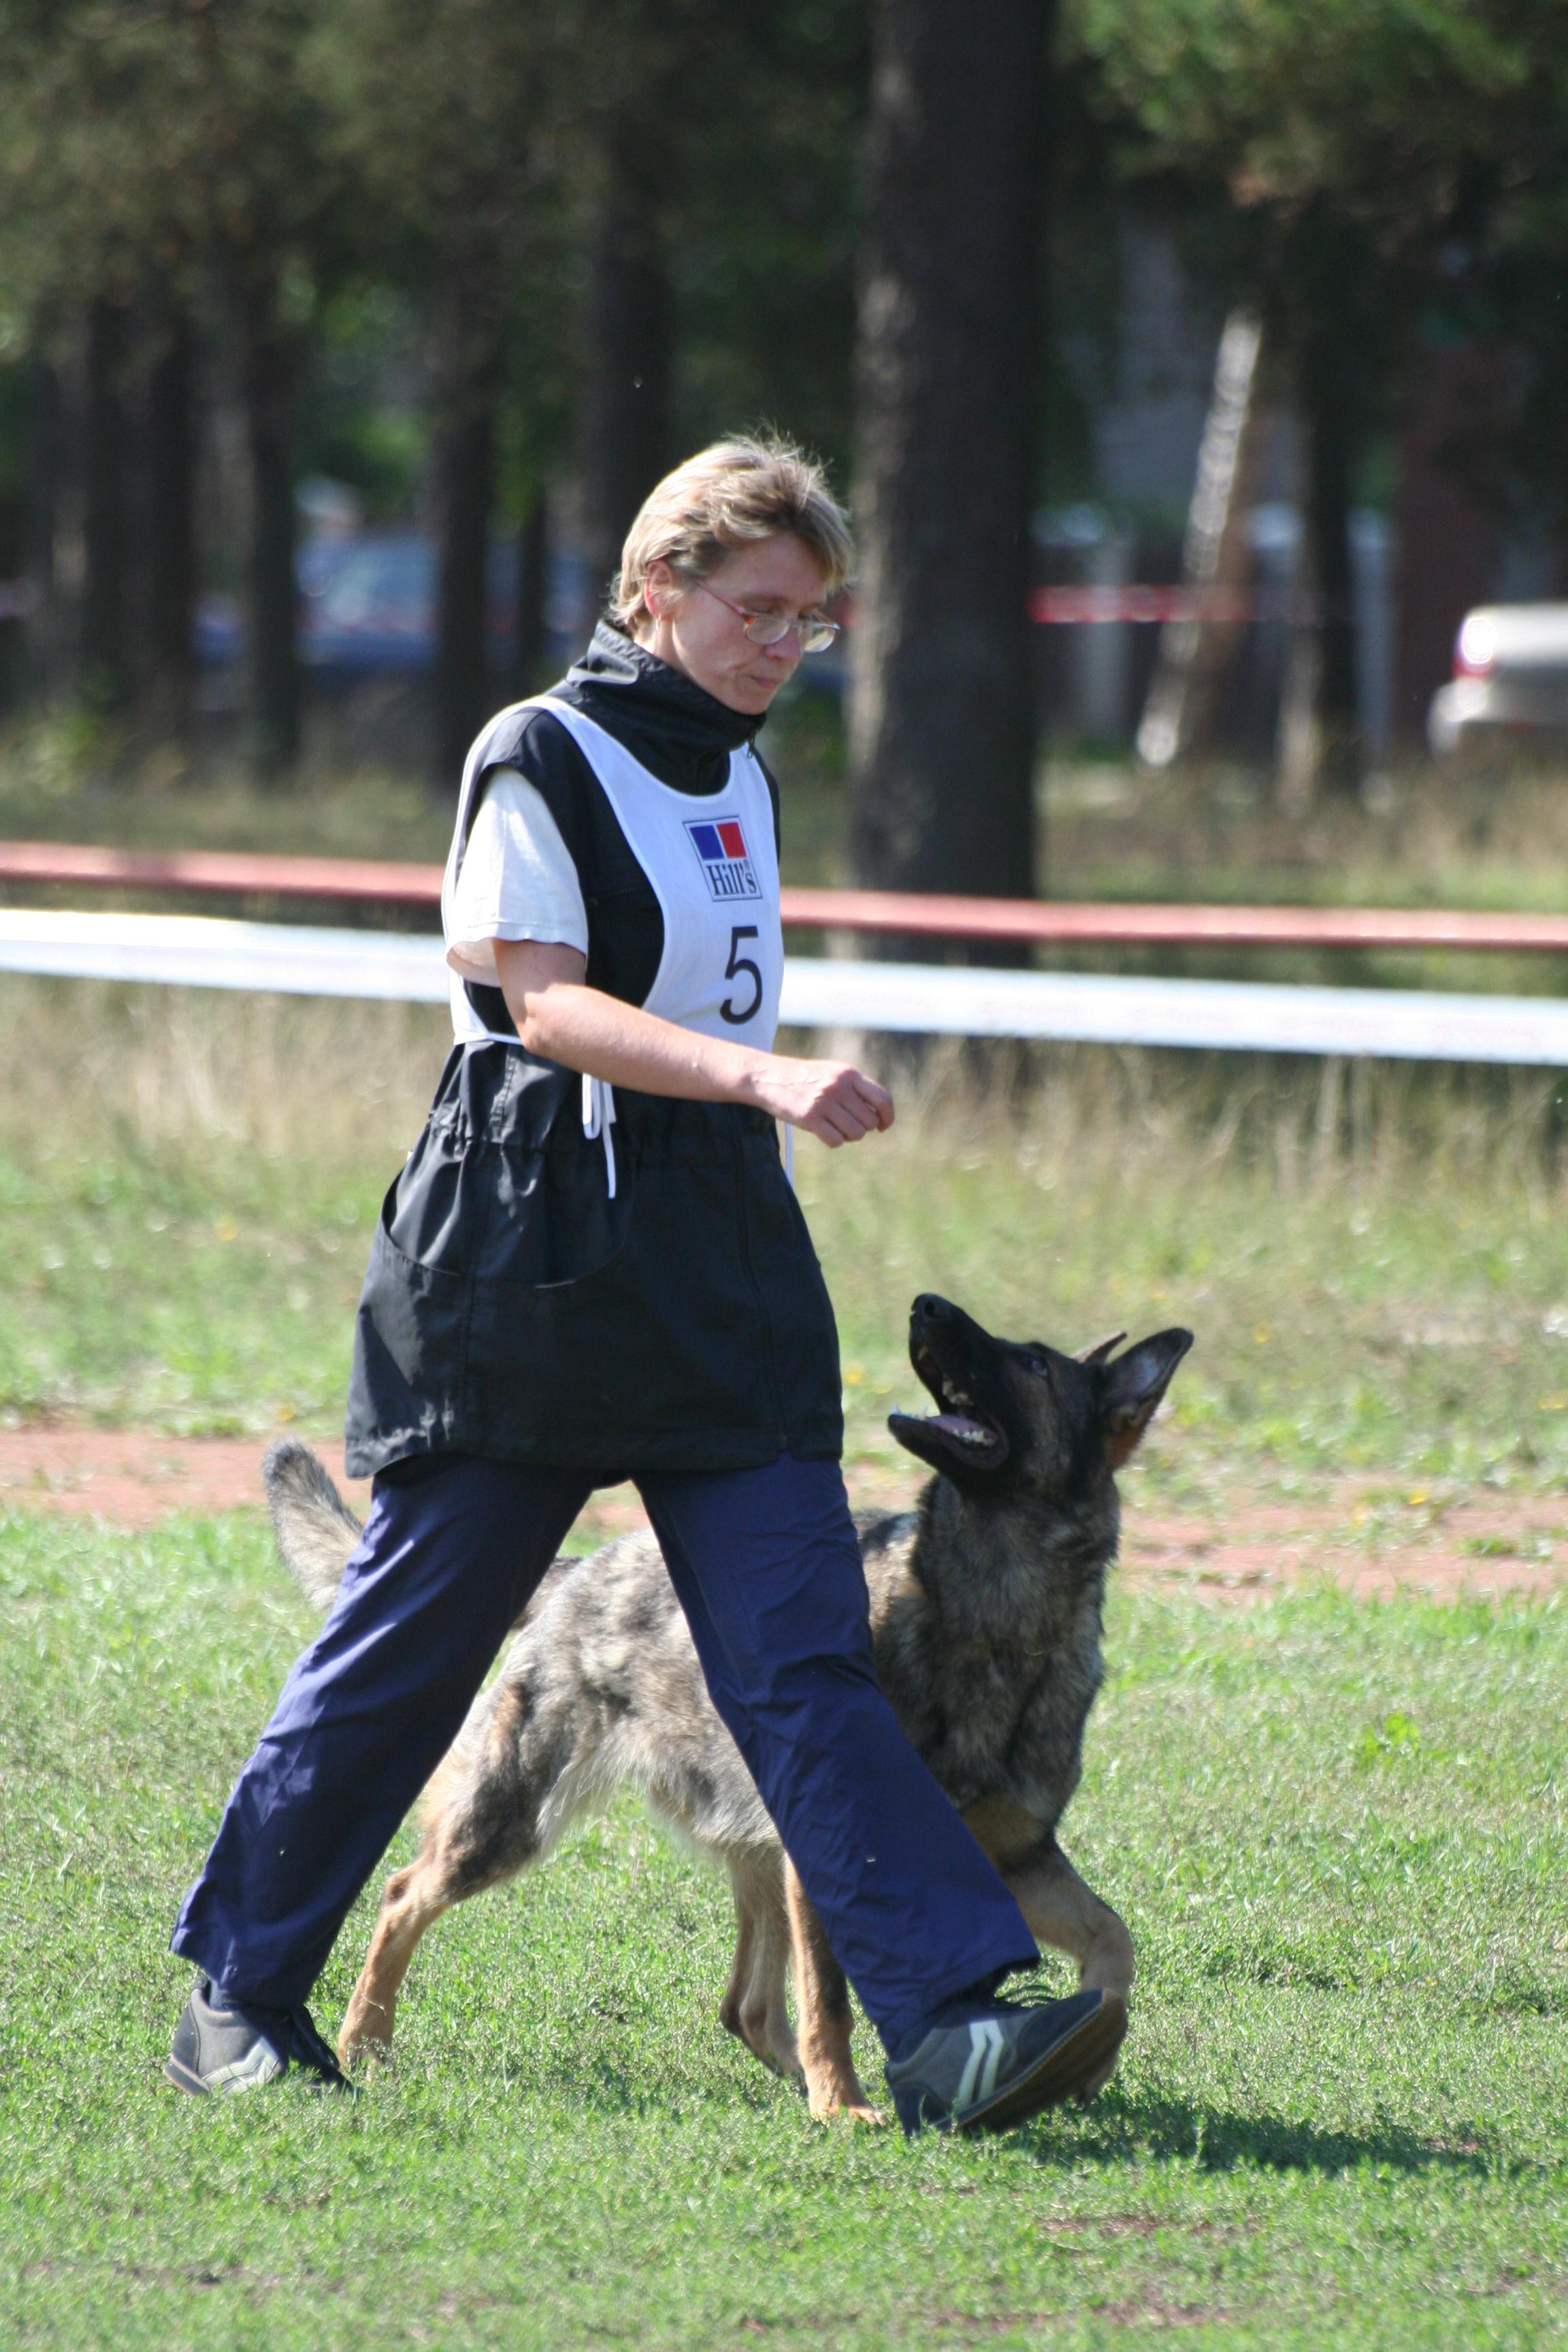 Image Result For Dog Training Leash